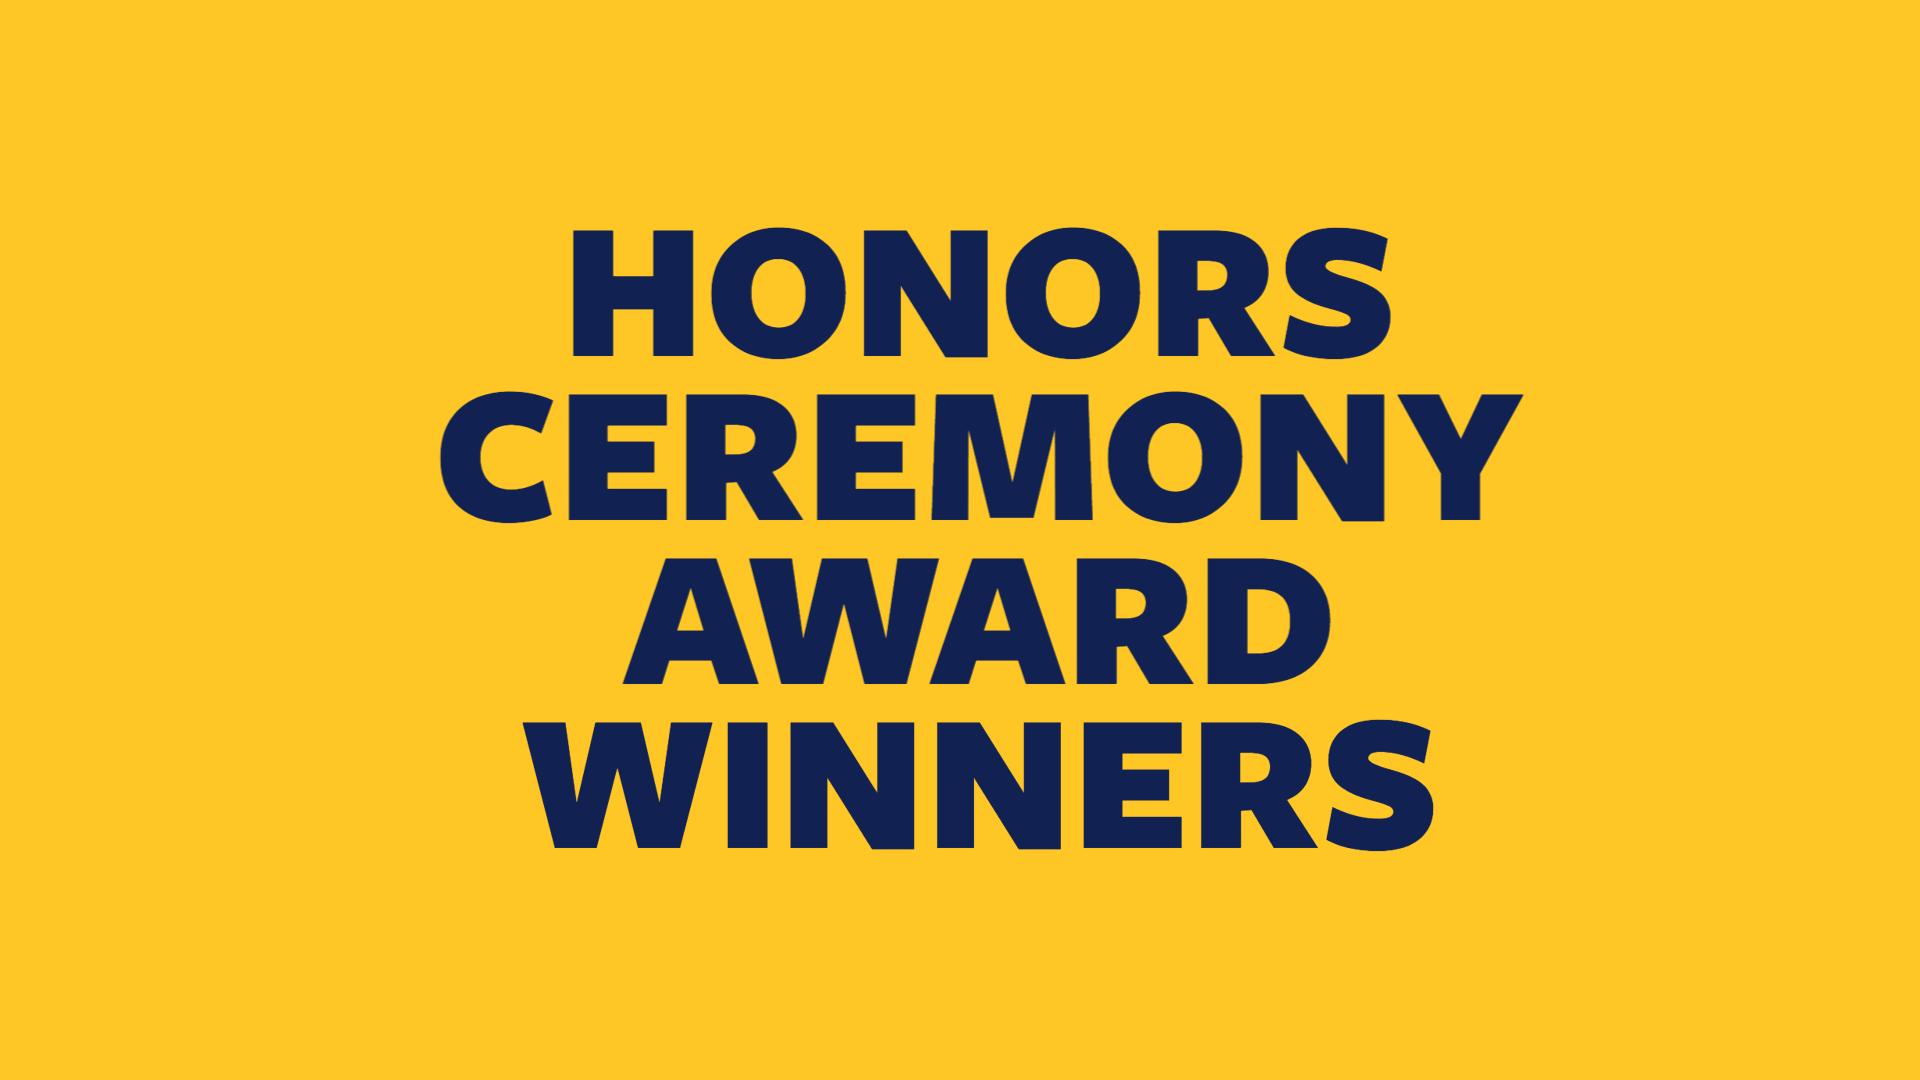 Honors Ceremony Winners